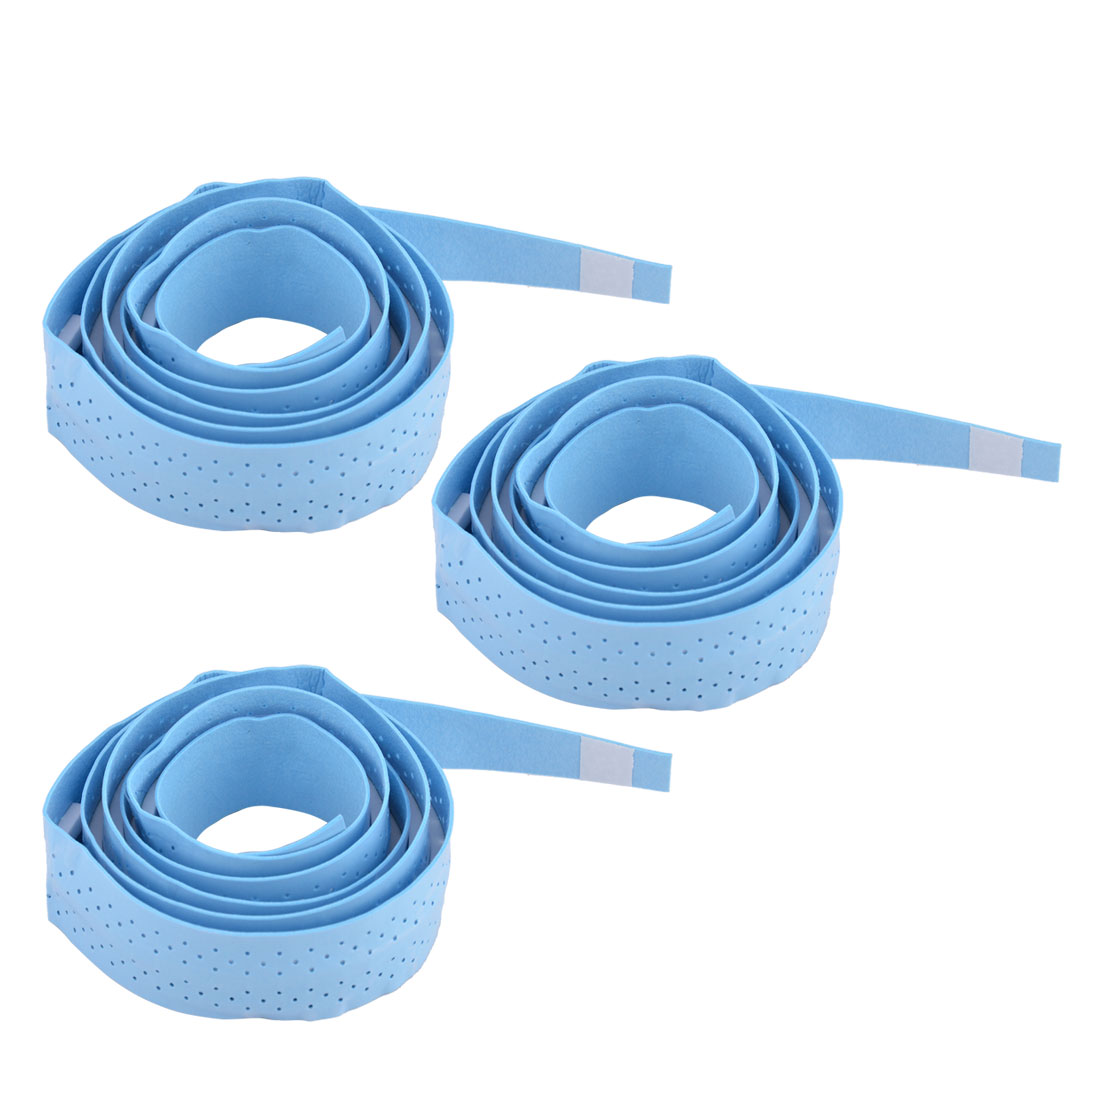 Badminton Foam Nonslip Racket Sweat Absorbing Wrap Over Grip Tape Blue 3 Pcs